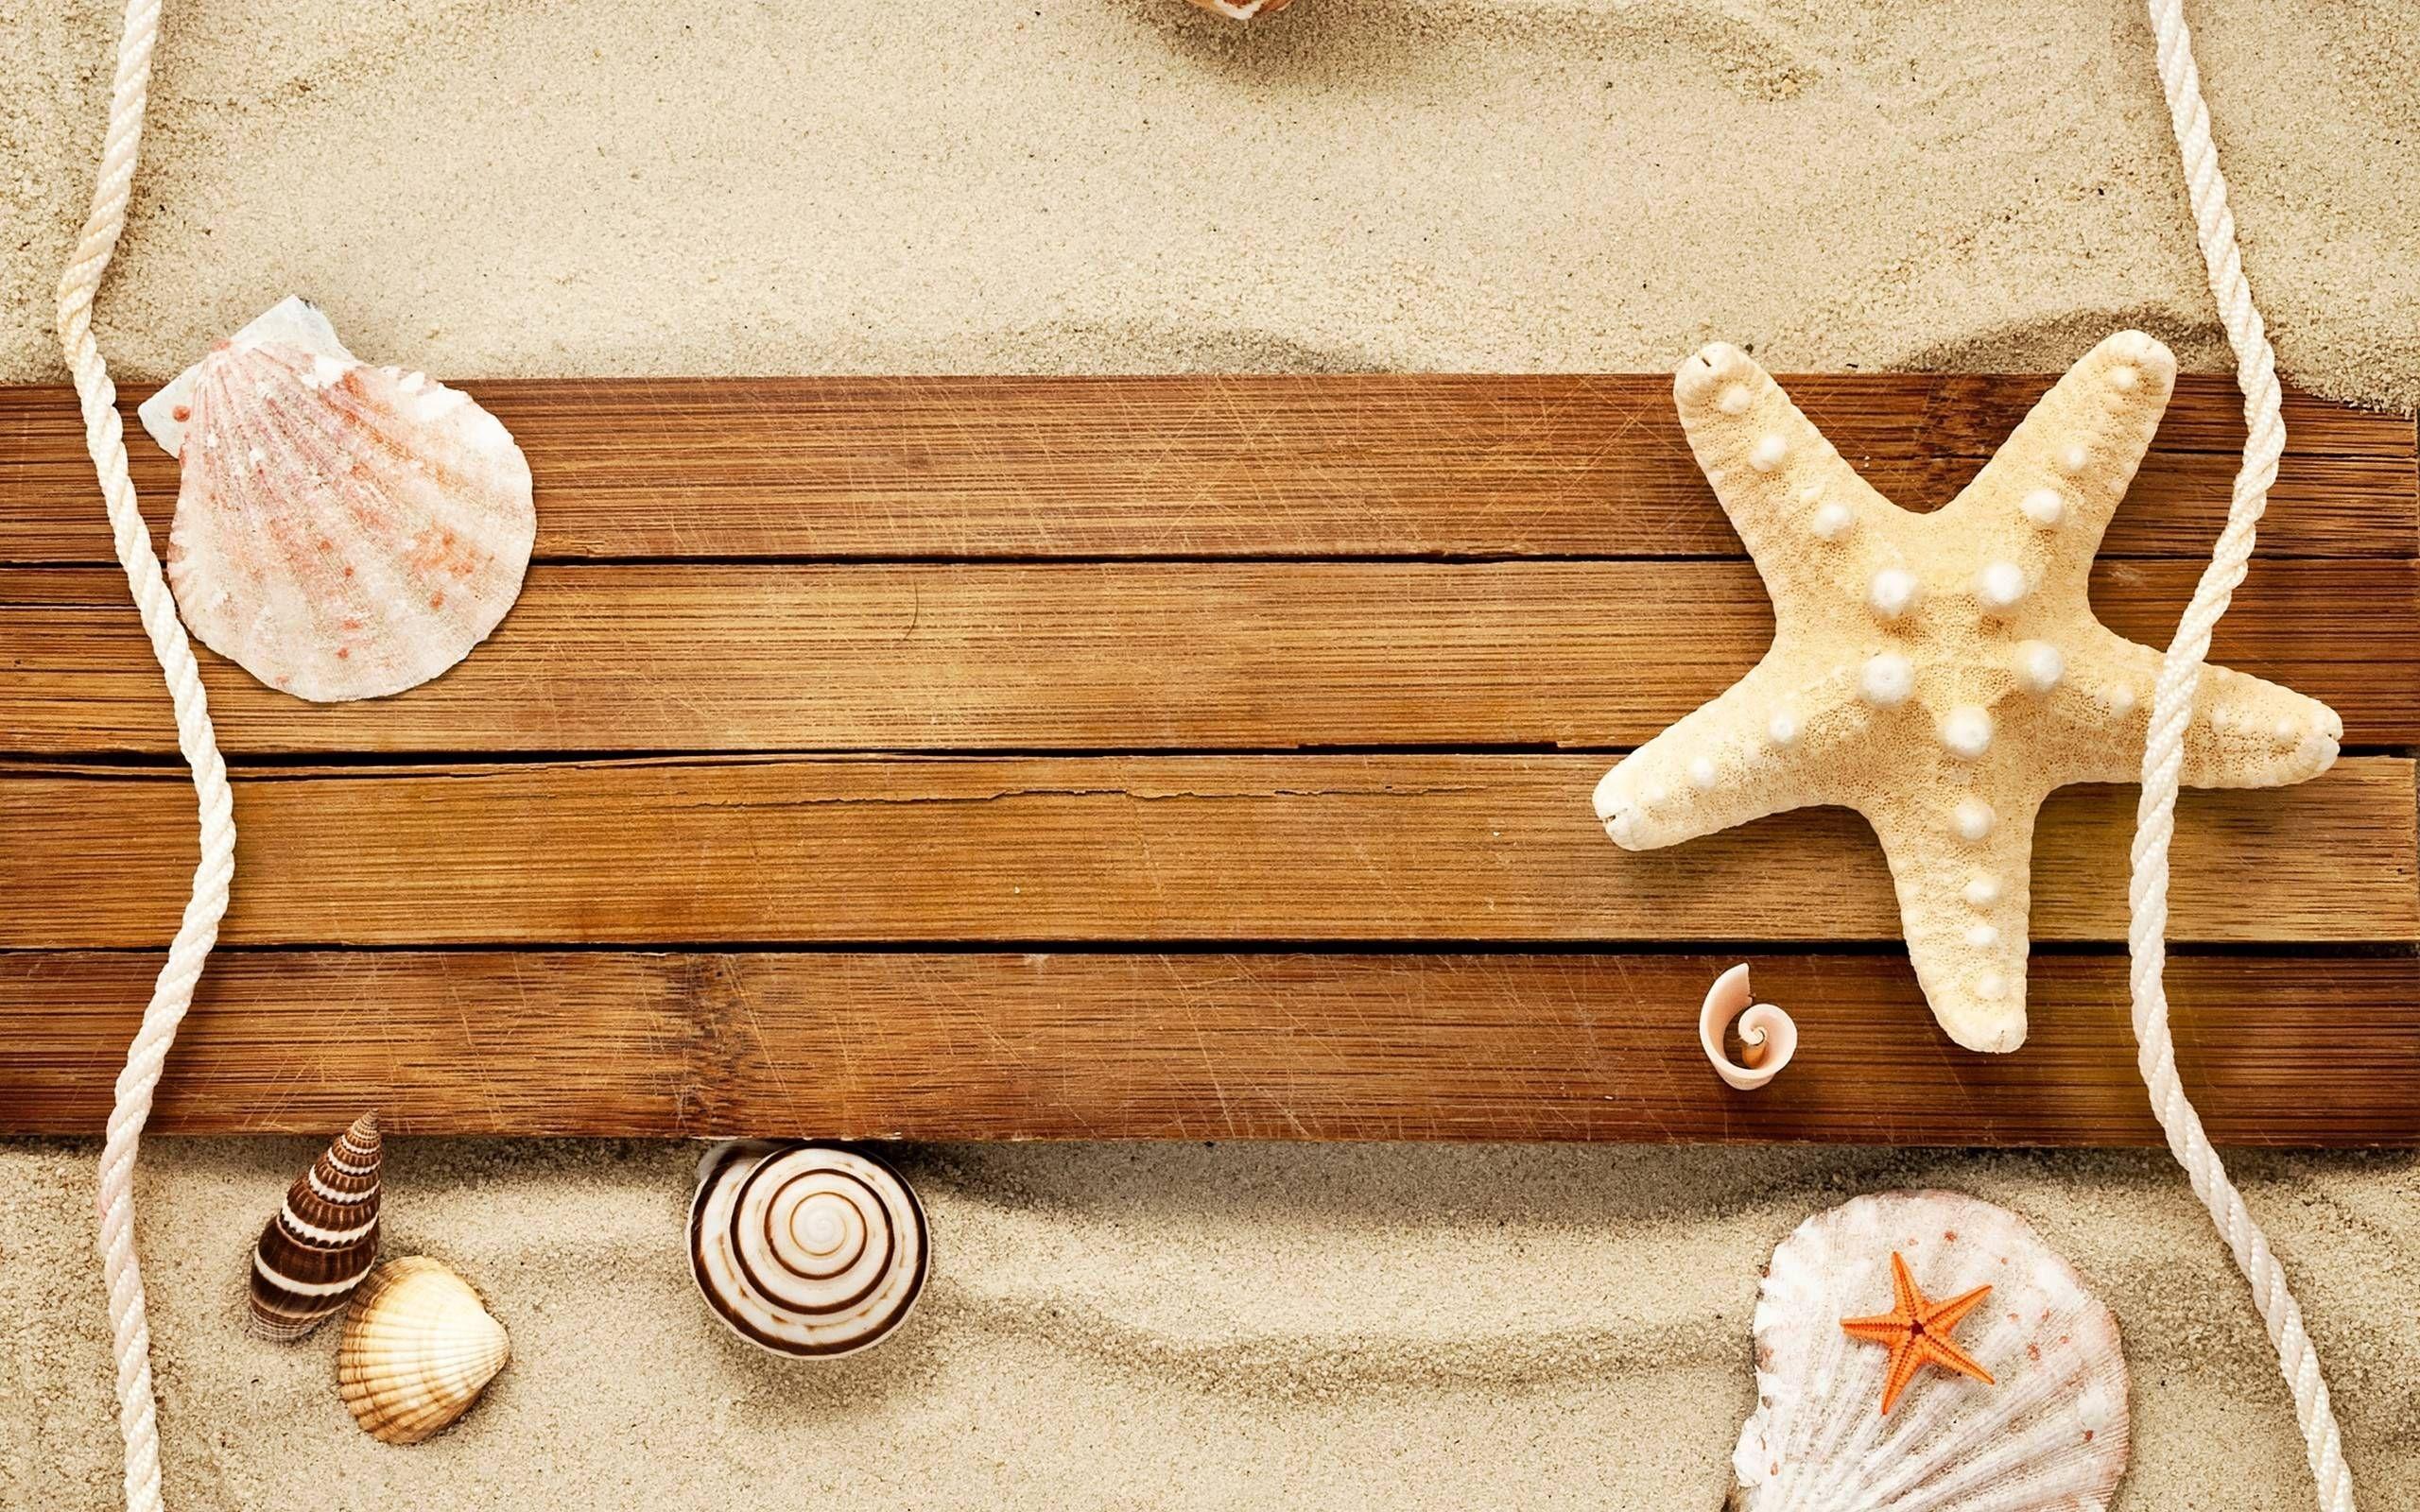 Seashells wallpaper 24 - Sea Shells Wallpapers High Resolution With Hd Wallpaper 2560x1600 Px 779 75 Kb